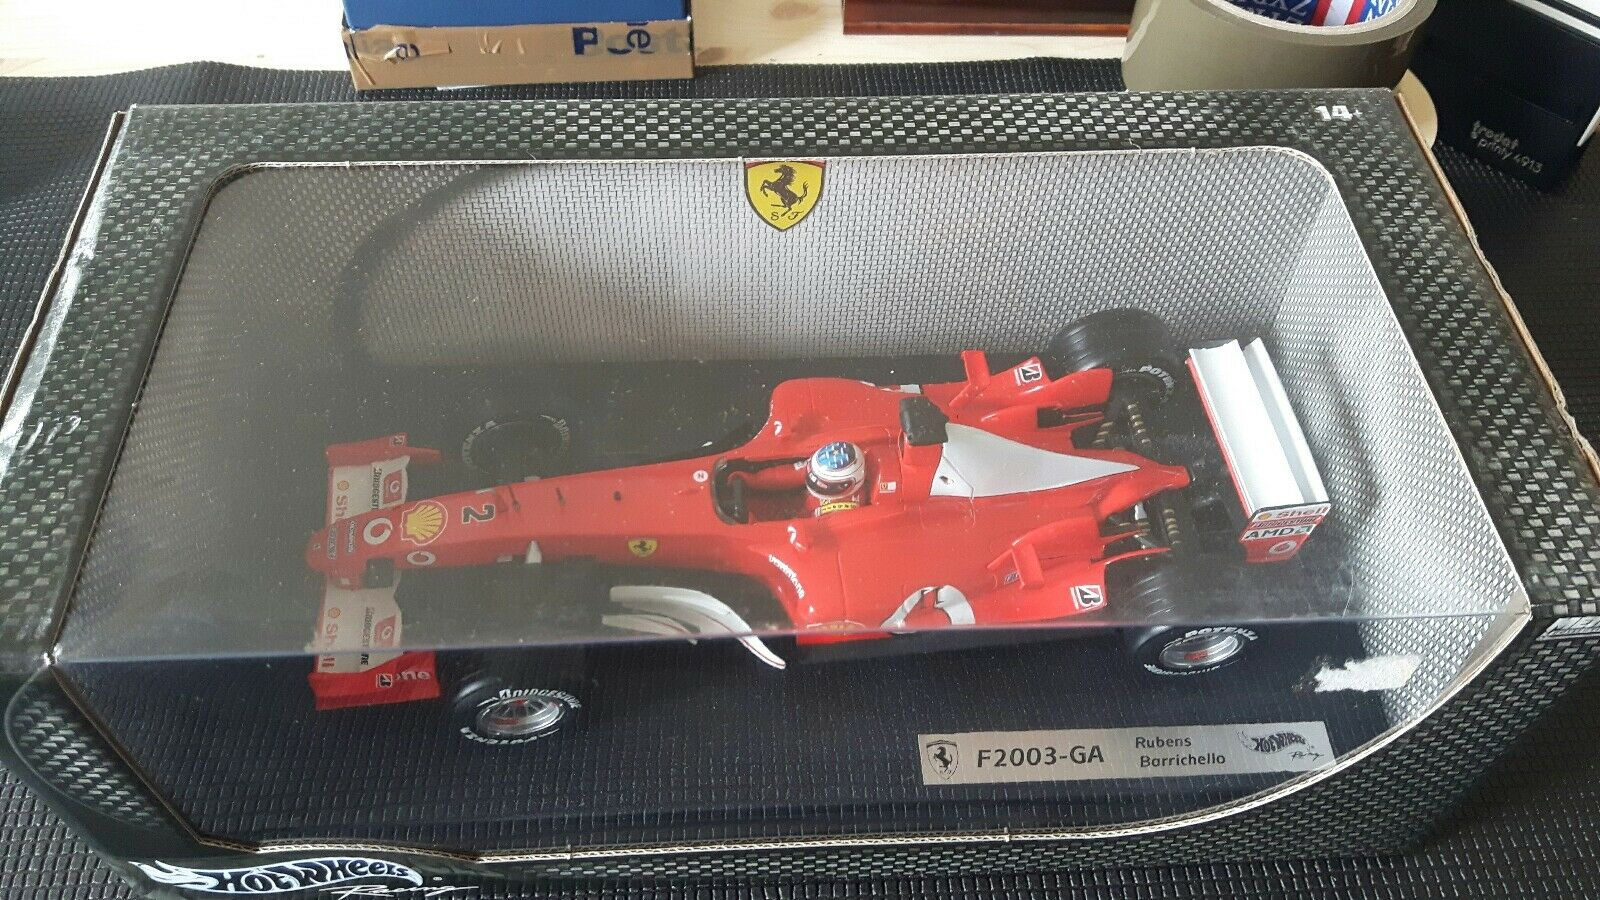 F1 Ferrari F 2003 GA  R. Barrichello 1 18